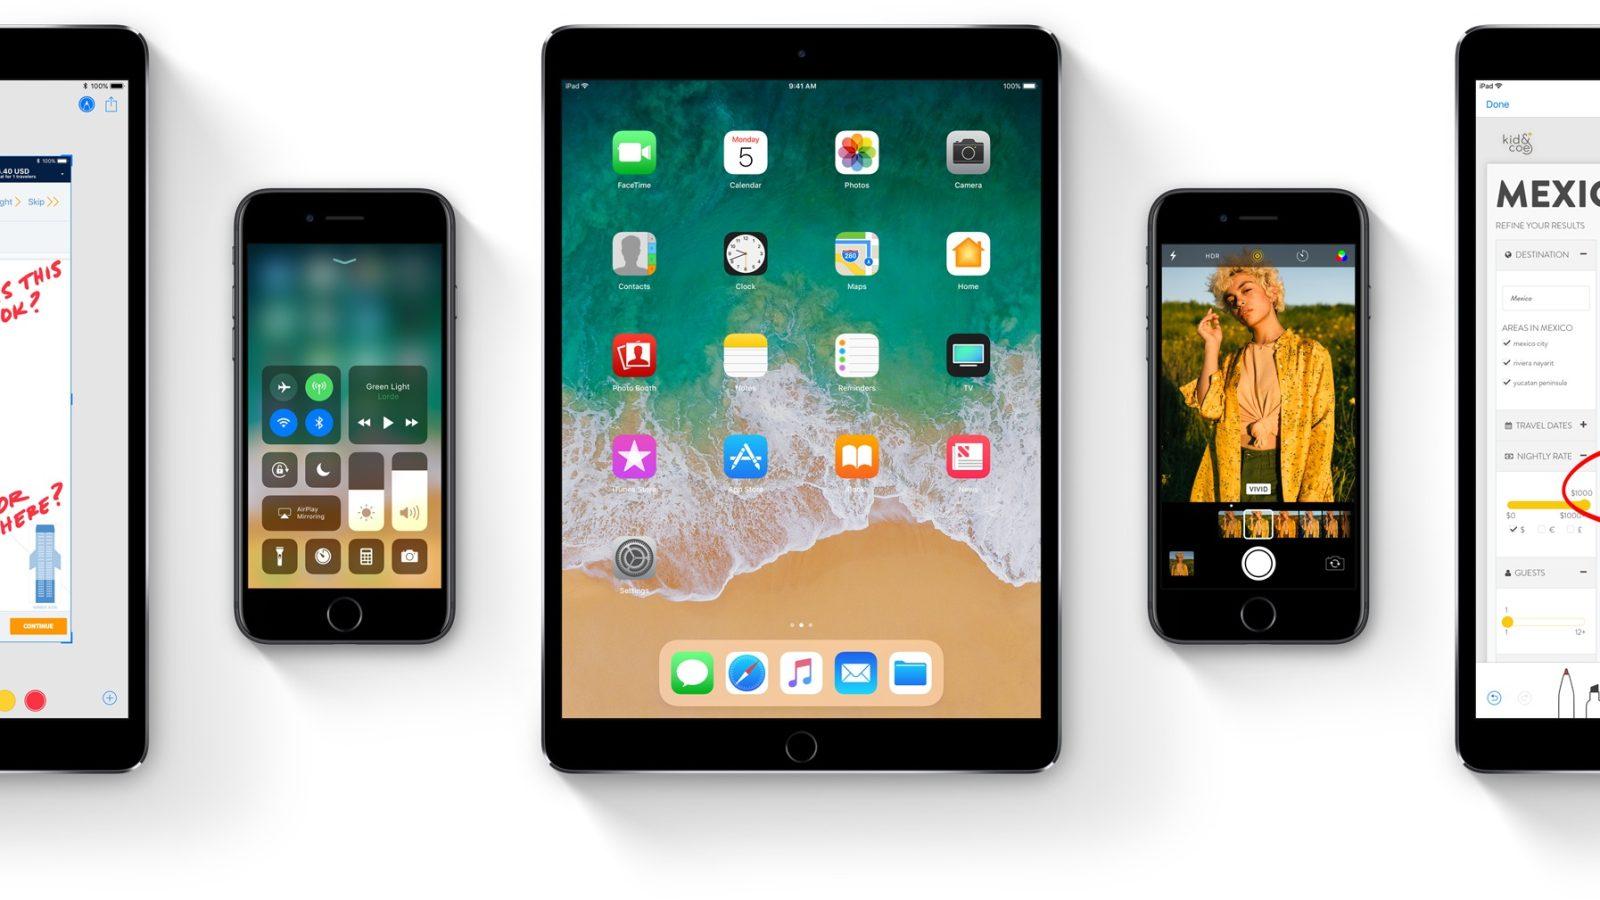 iOS 11 promete grandes cosas